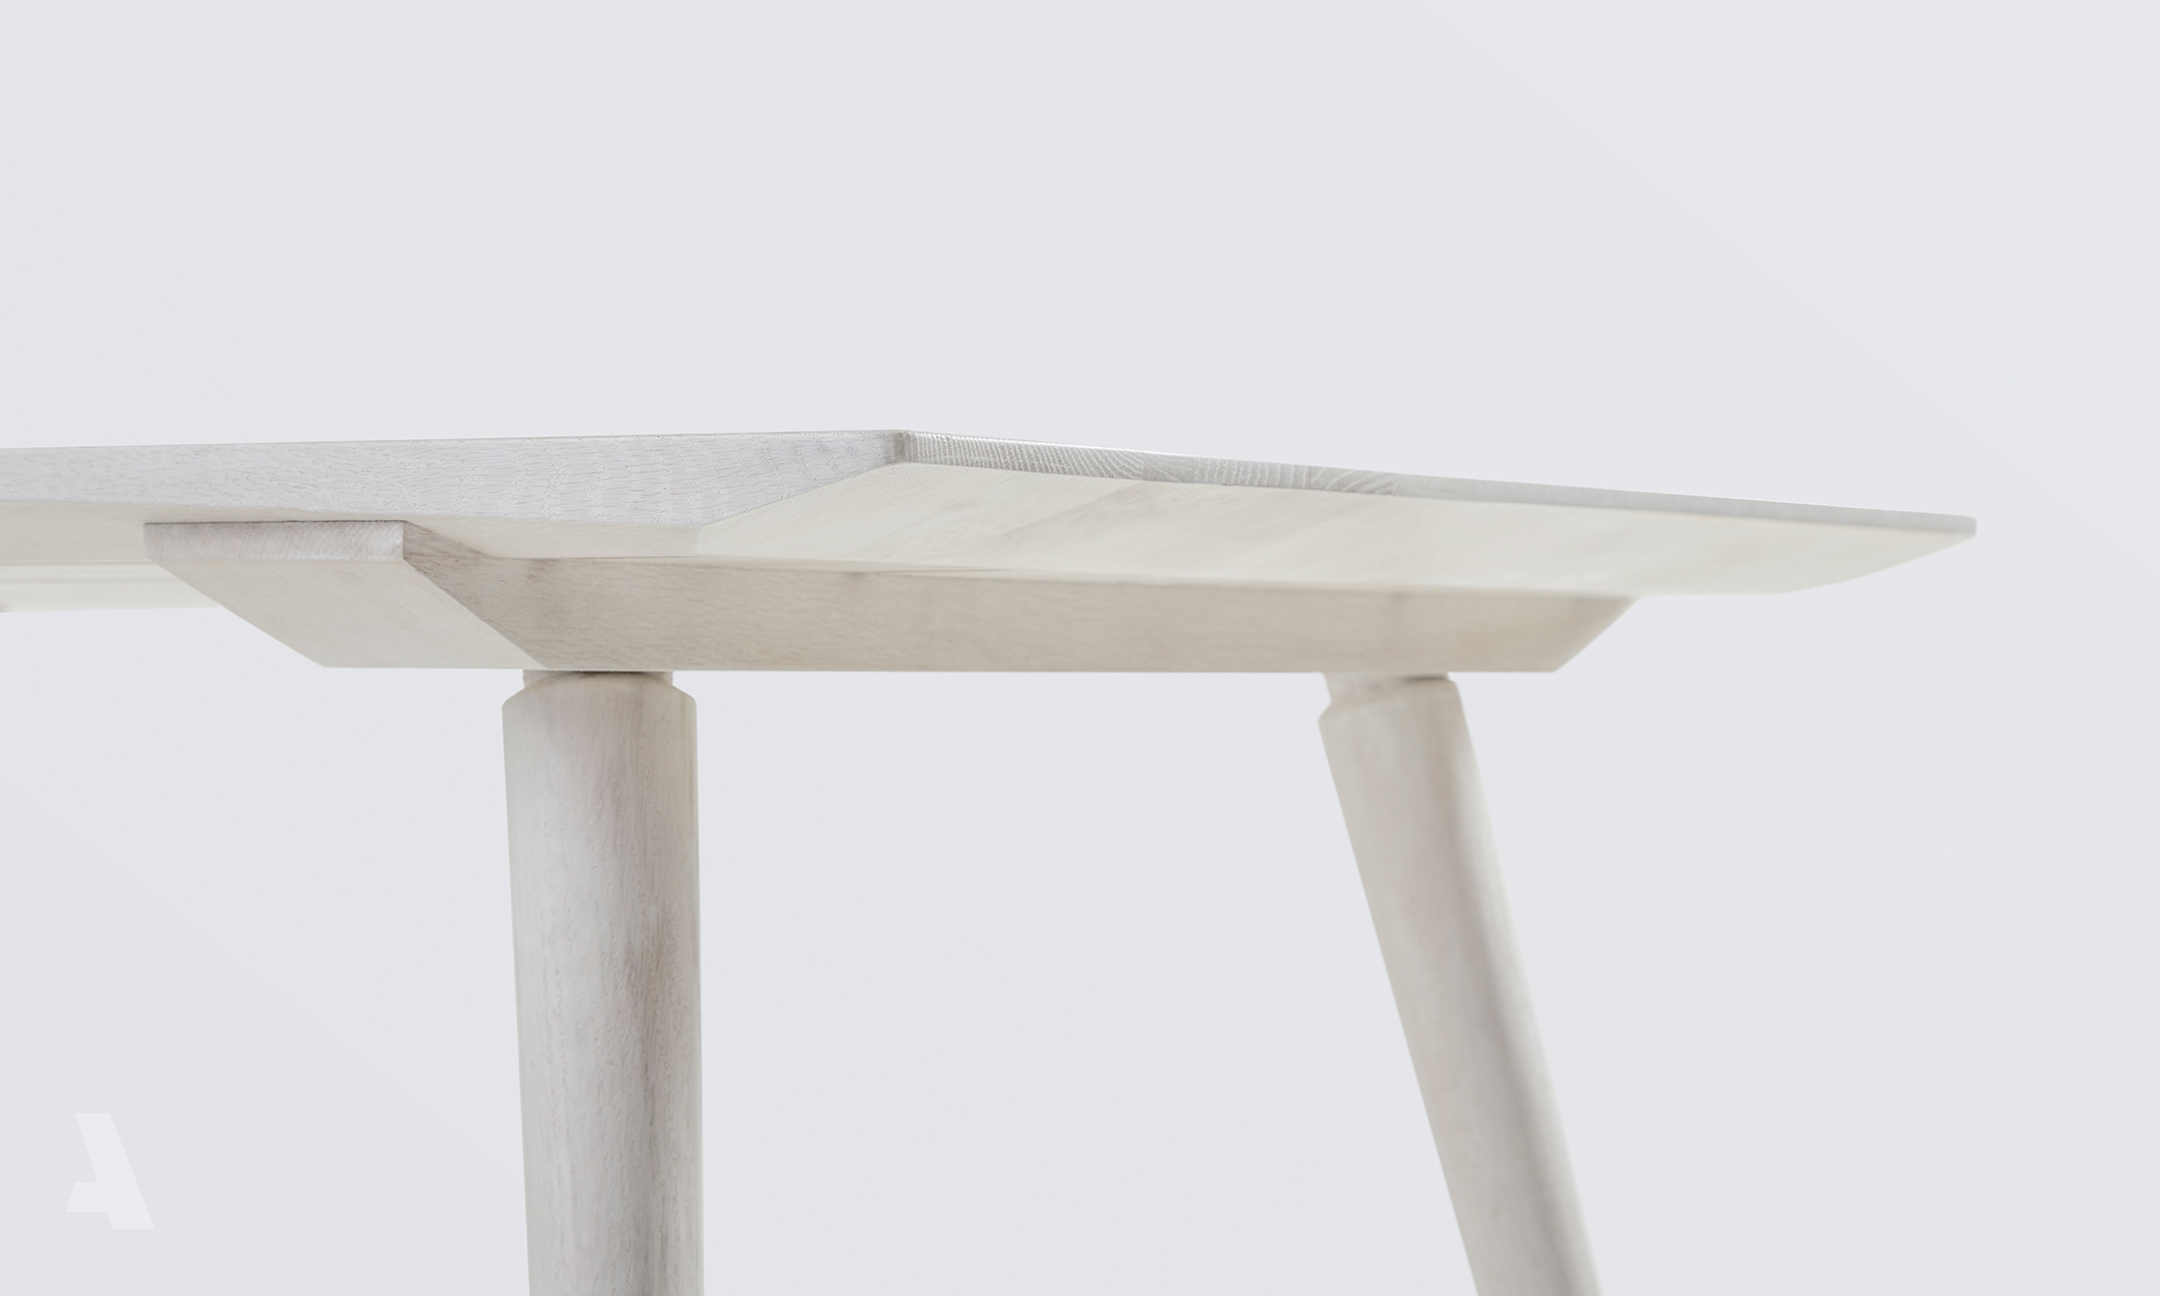 Gallery-Watermarked_0019_Dining-Table-003.jpg